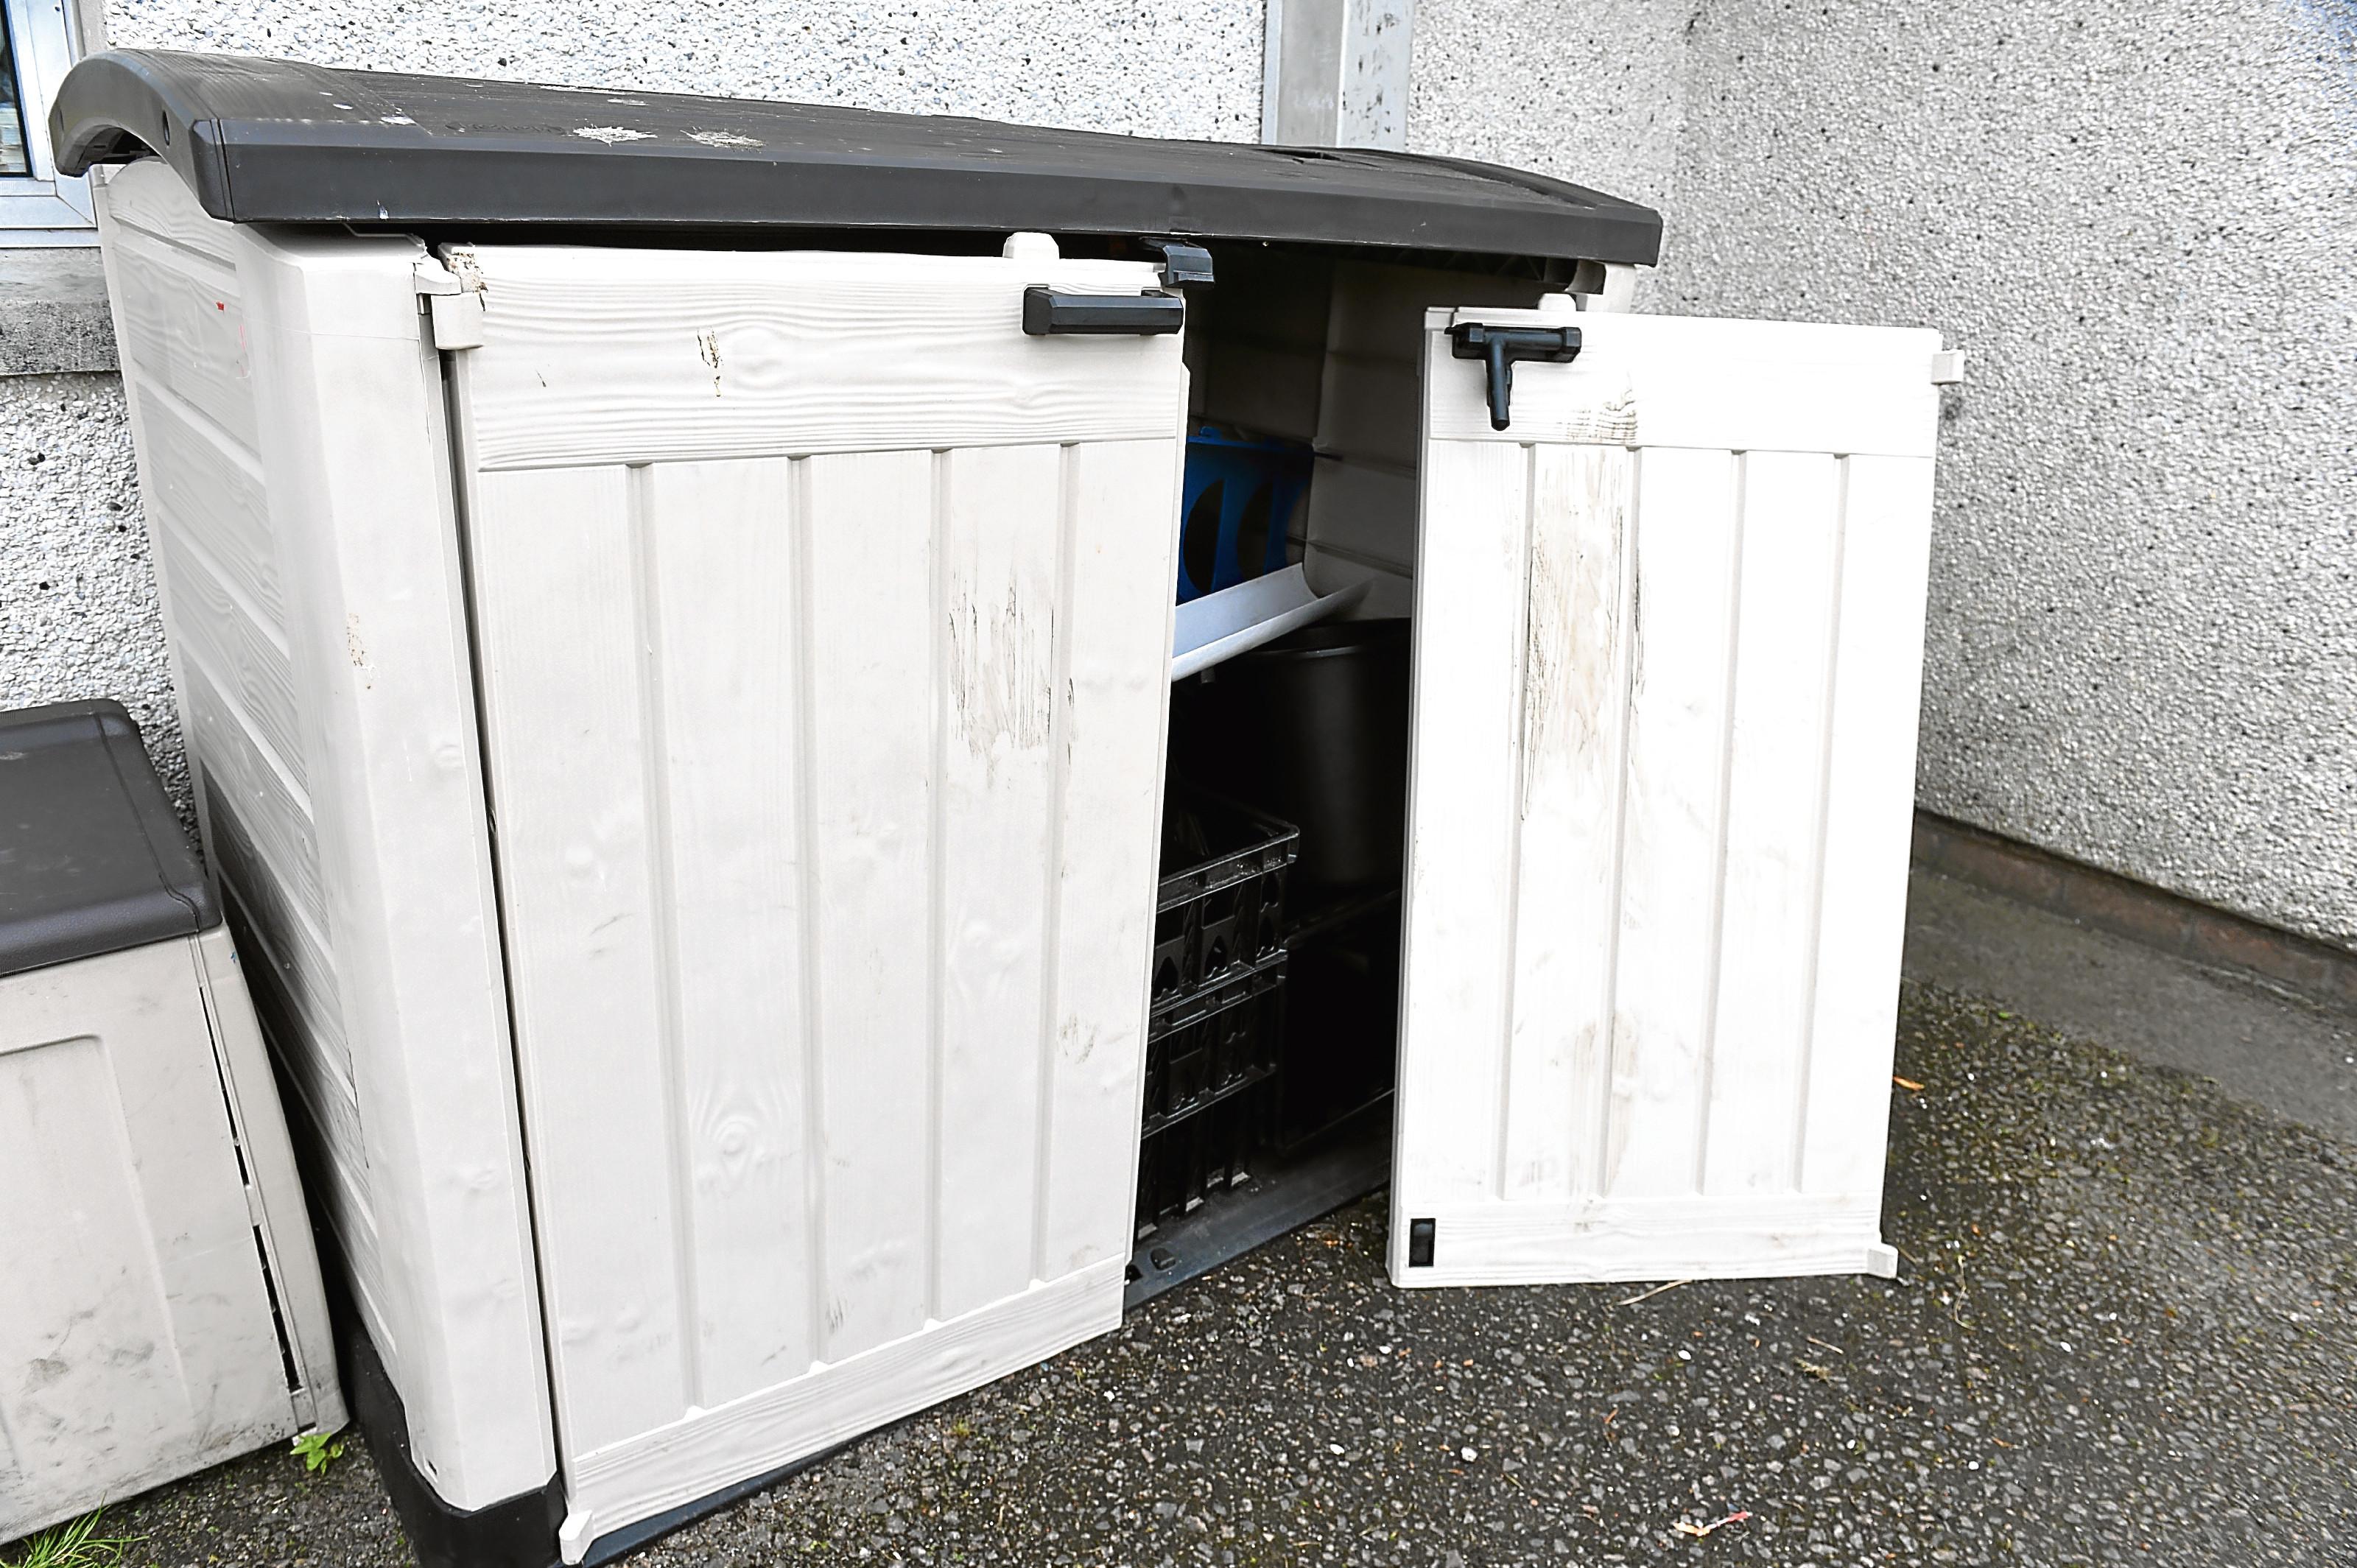 The vandalised storage box at Glashieburn.